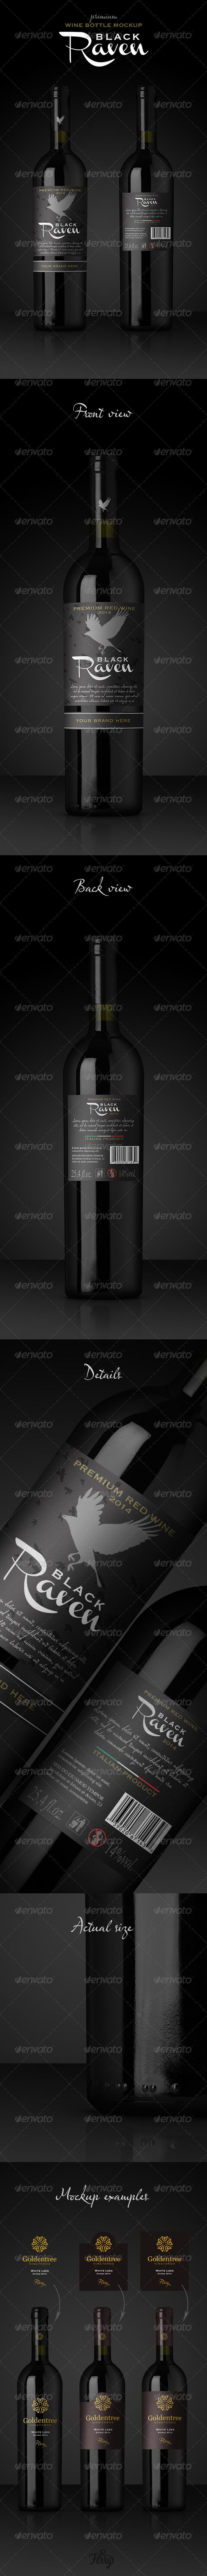 GraphicRiver Premium Red Wine Mockup 6711653